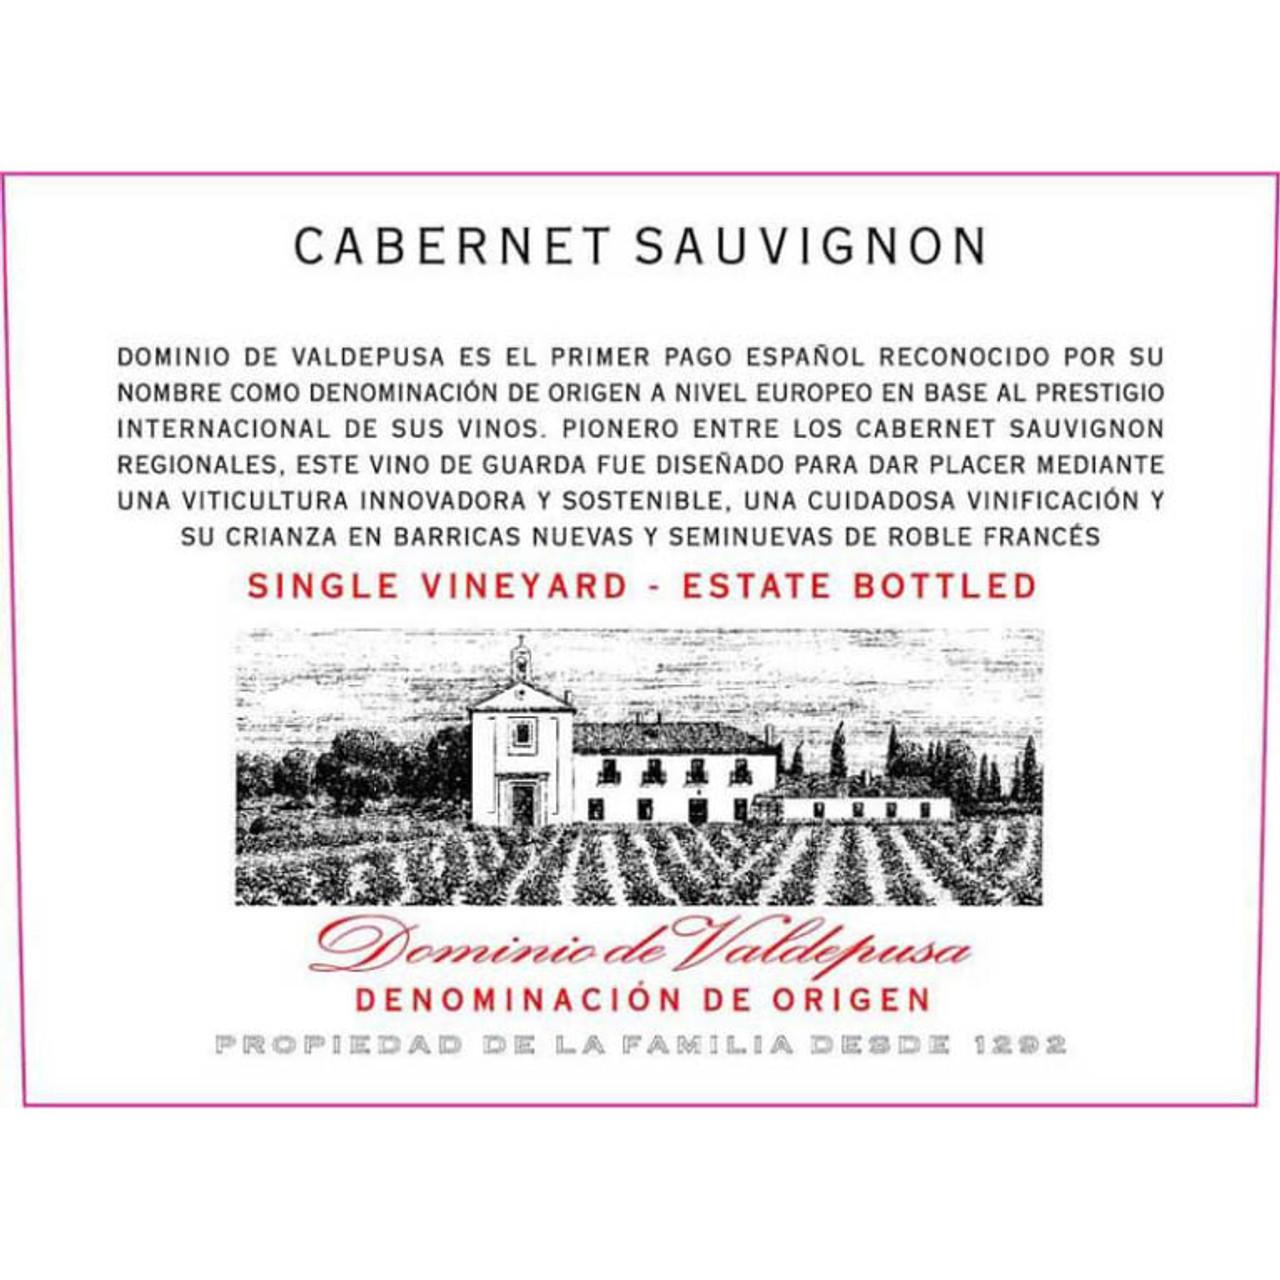 Marques de Grinon, Dominio de Valdepusa Cabernet Sauvignon 2013